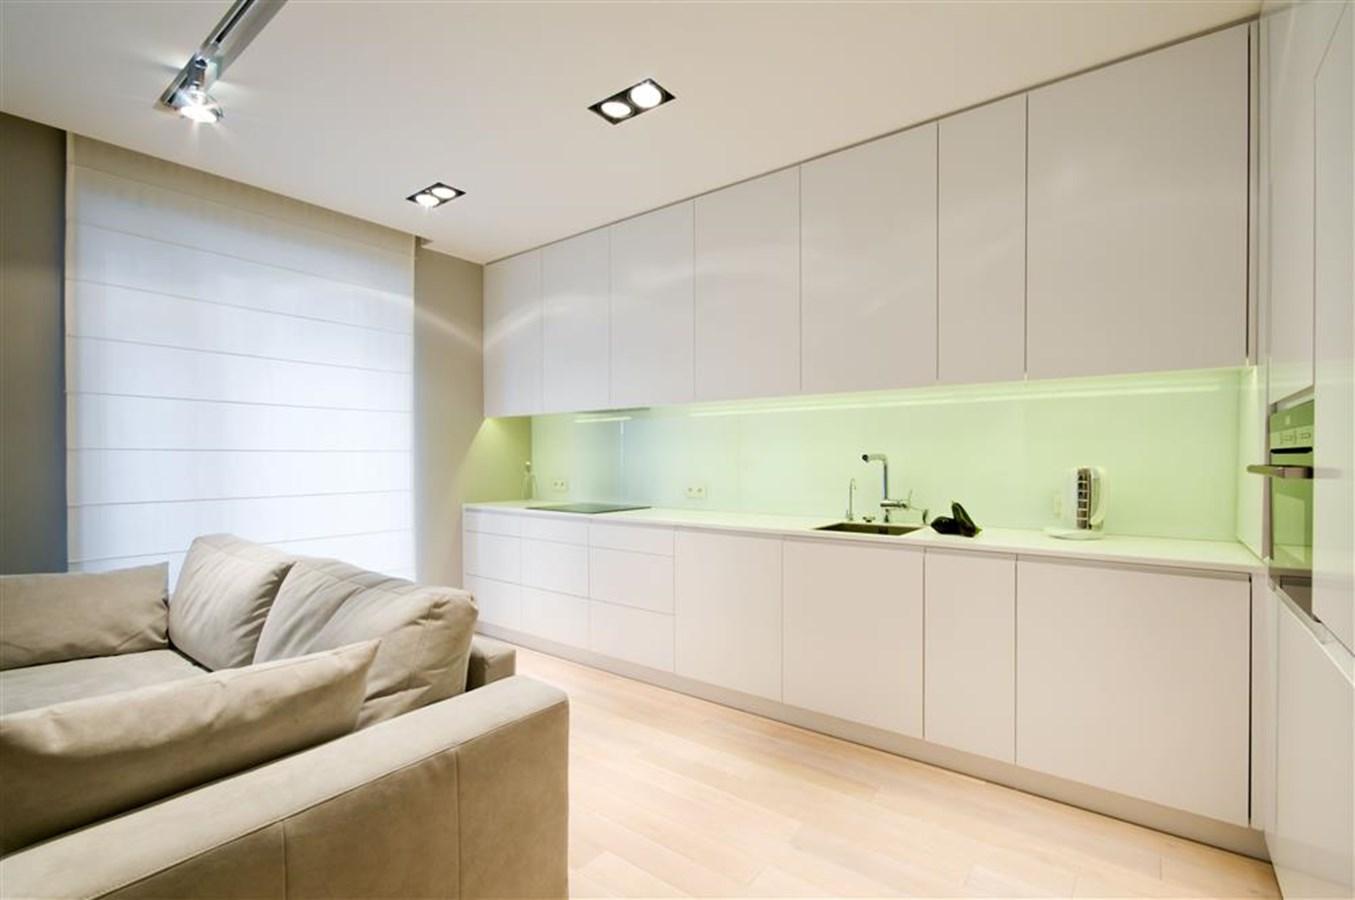 Otwarta kuchnia w bieli hola design homesquare - Bia A Kuchnia W Salonie